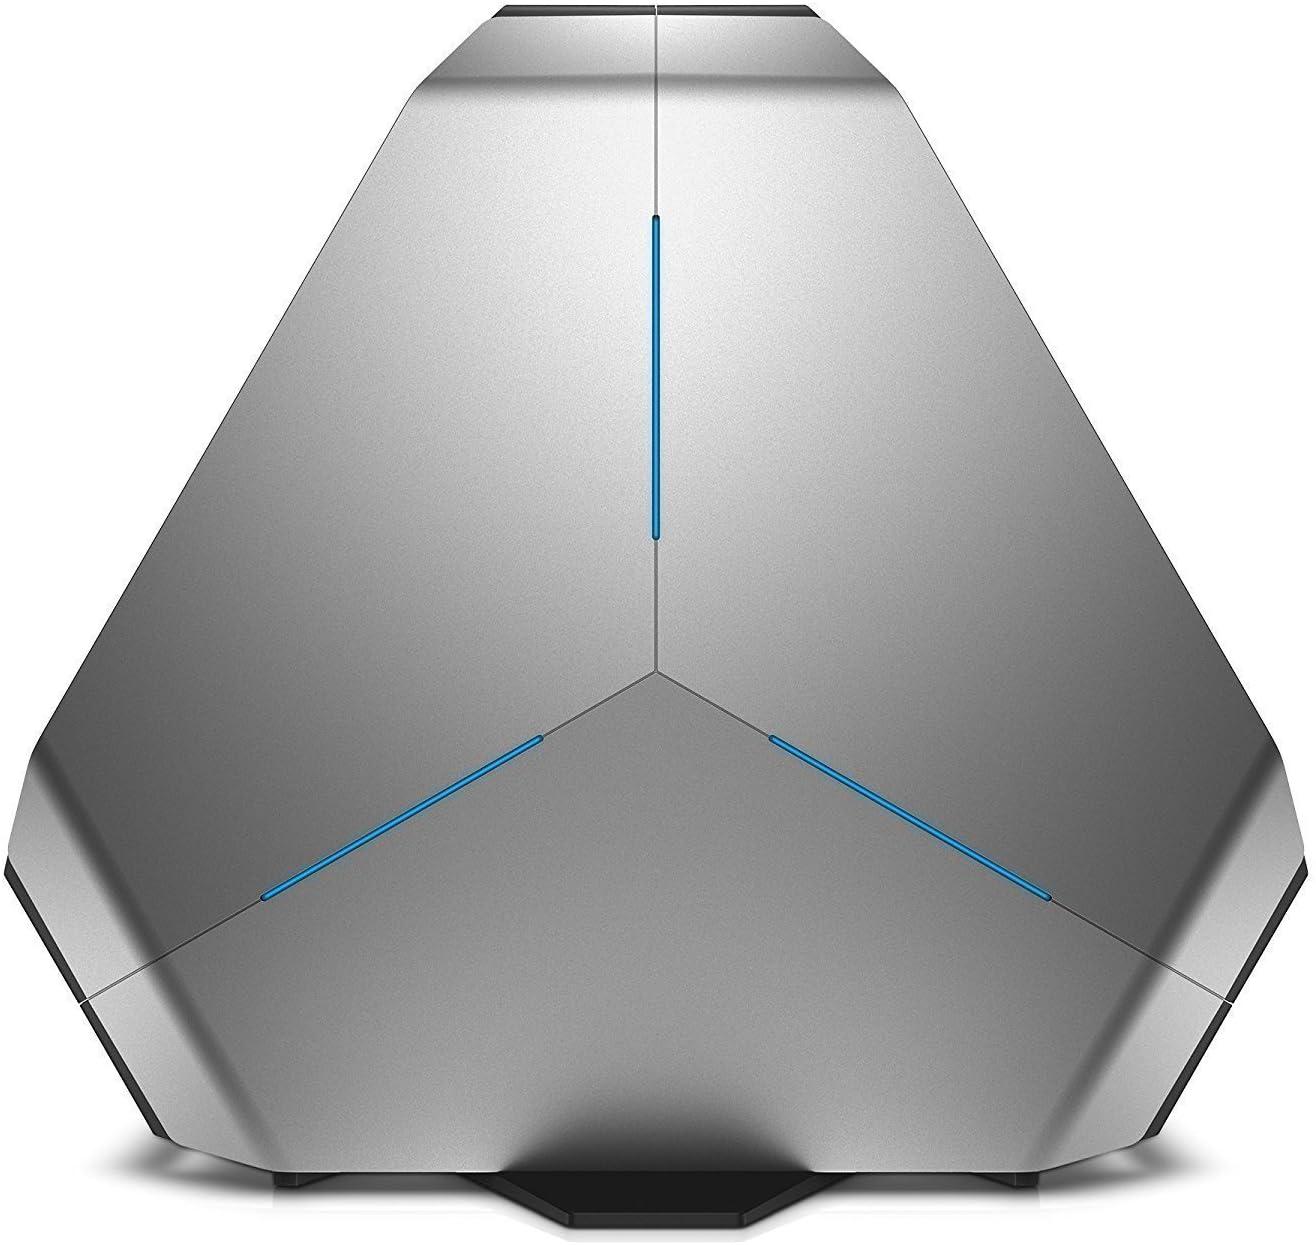 Alienware Area 51 R2 Gaming Desktop, Intel Core i7-6800K 6-Core up to 3.6GHz, 32GB DDR4, 2TB 7200RPM HDD + 512GB SSD, Nvidia GeForce GTX 1080 8GB GDDR5X Windows 10 (Renewed)